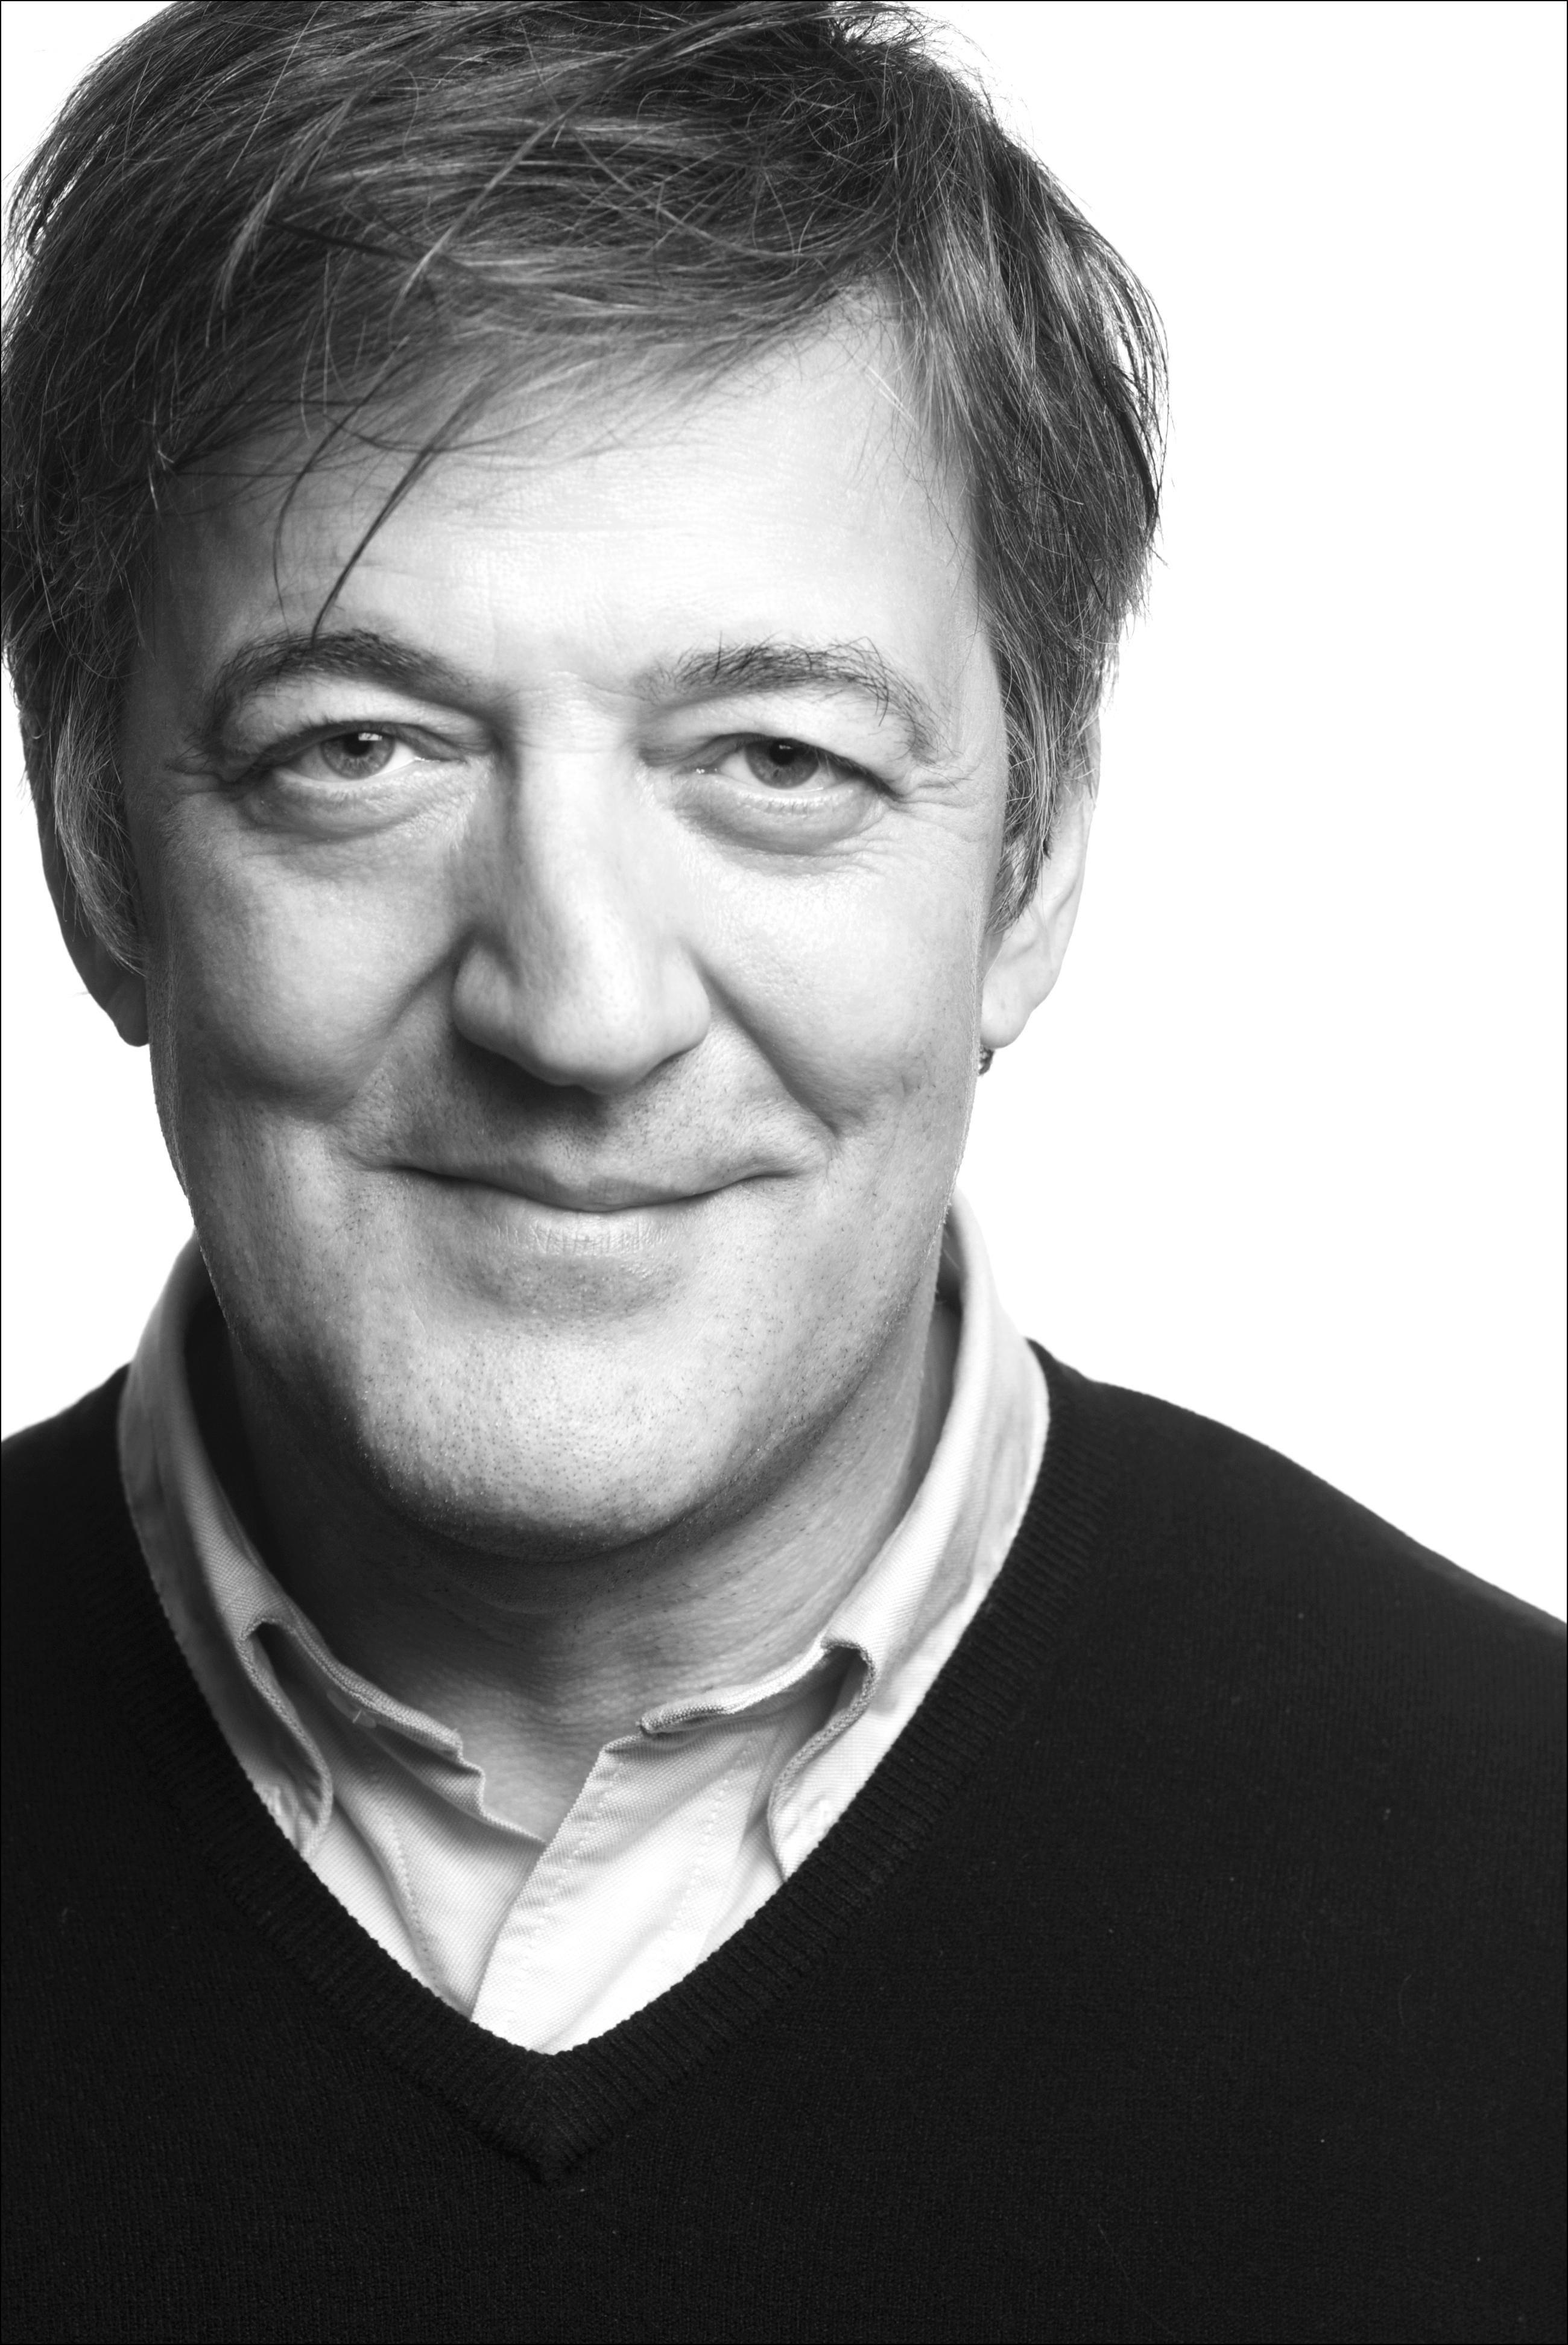 Watch Stephen Fry (born 1957) video